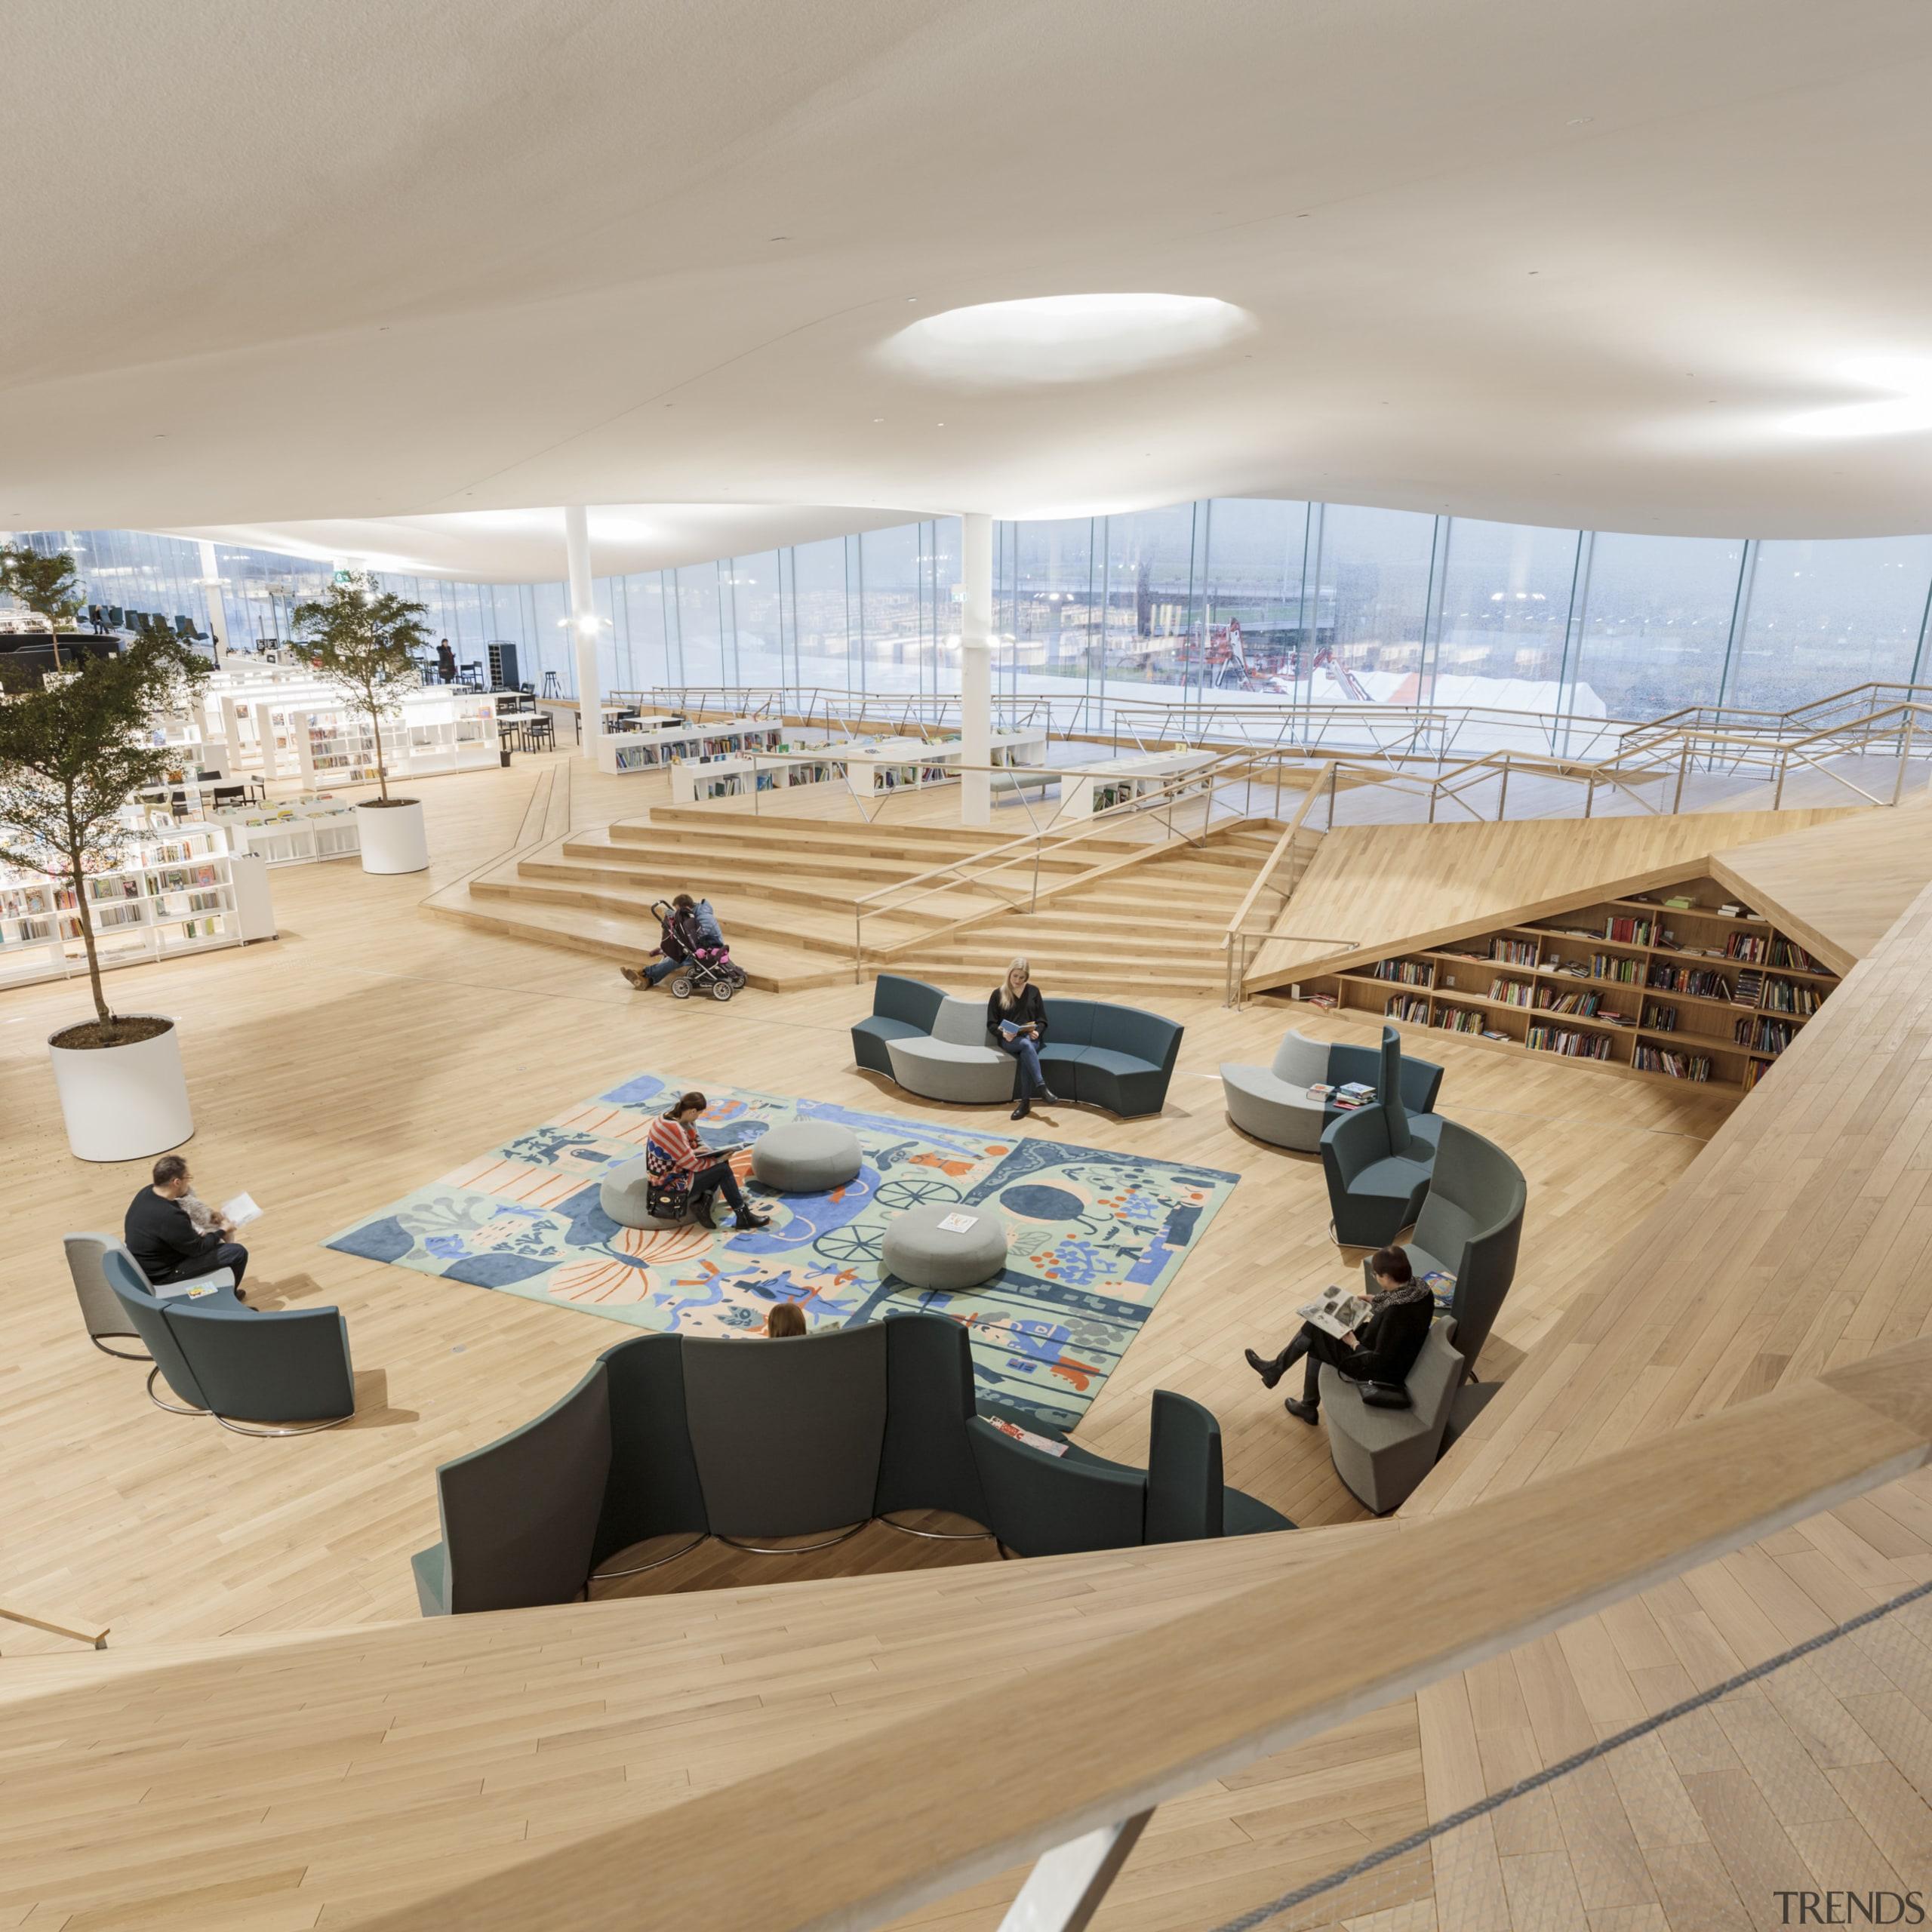 Column-free areas are a feature of the new architecture, building, design, floor, interior design, room, sport venue, gray